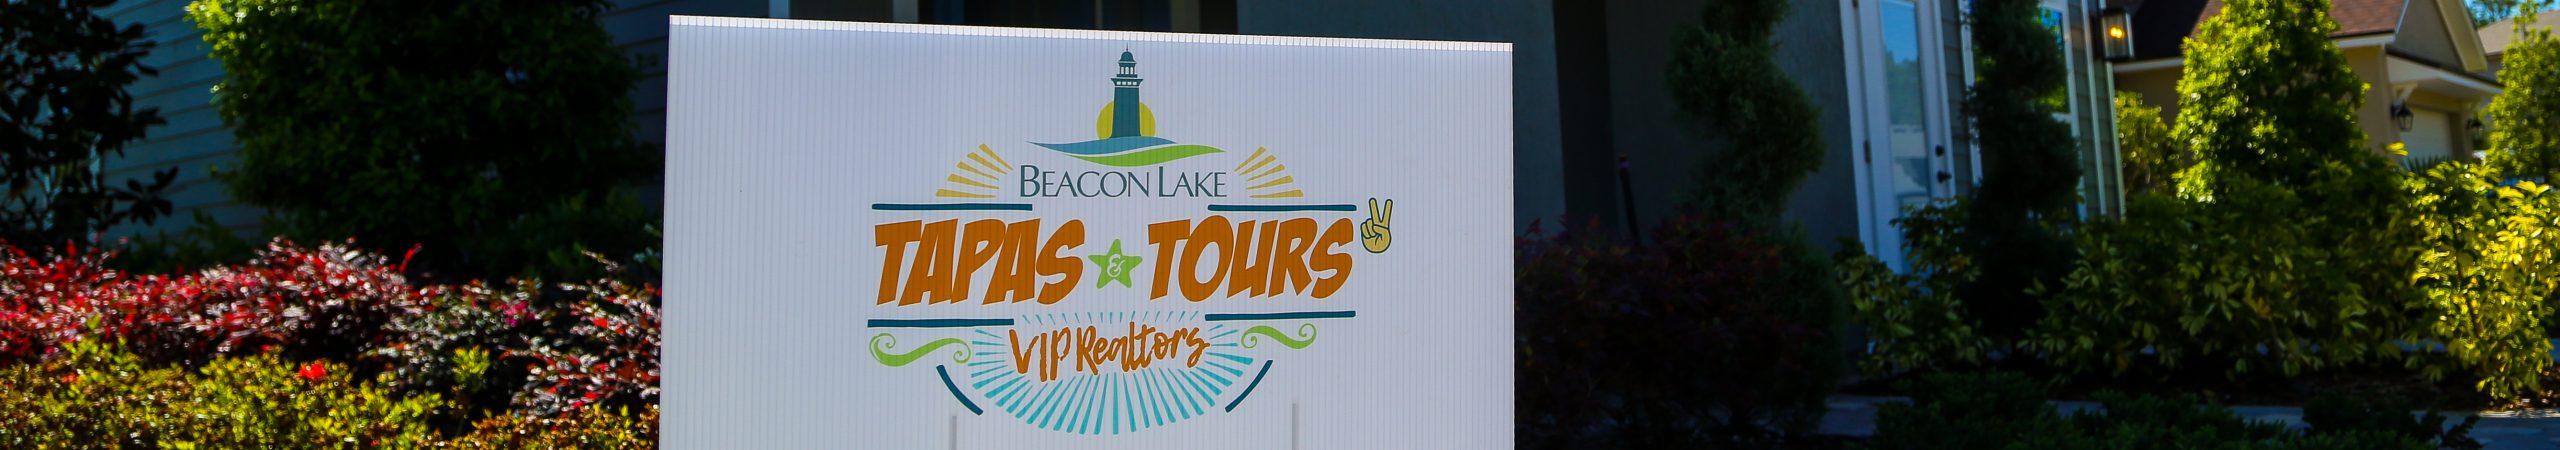 Beacon Lake Tapas and Tours II